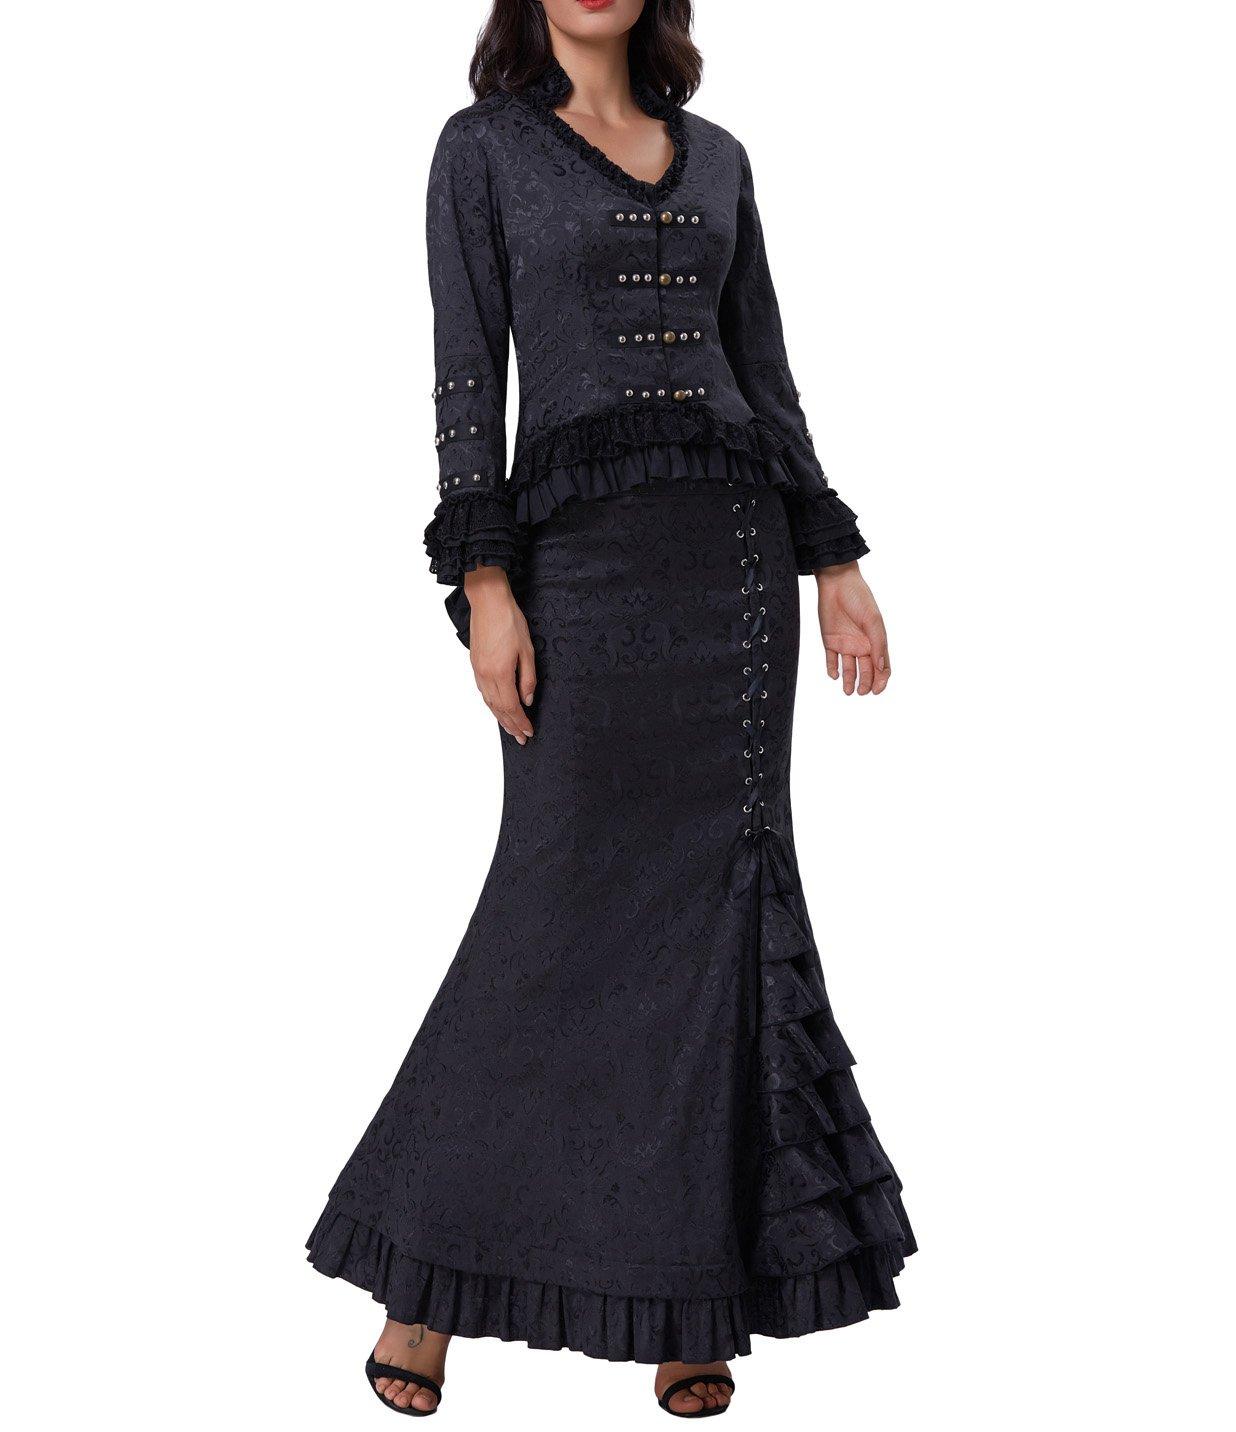 Belle Poque Womens Steampunk Victorian Mermaid Skirt High Waist Vintage Maxi Skirt BP000204